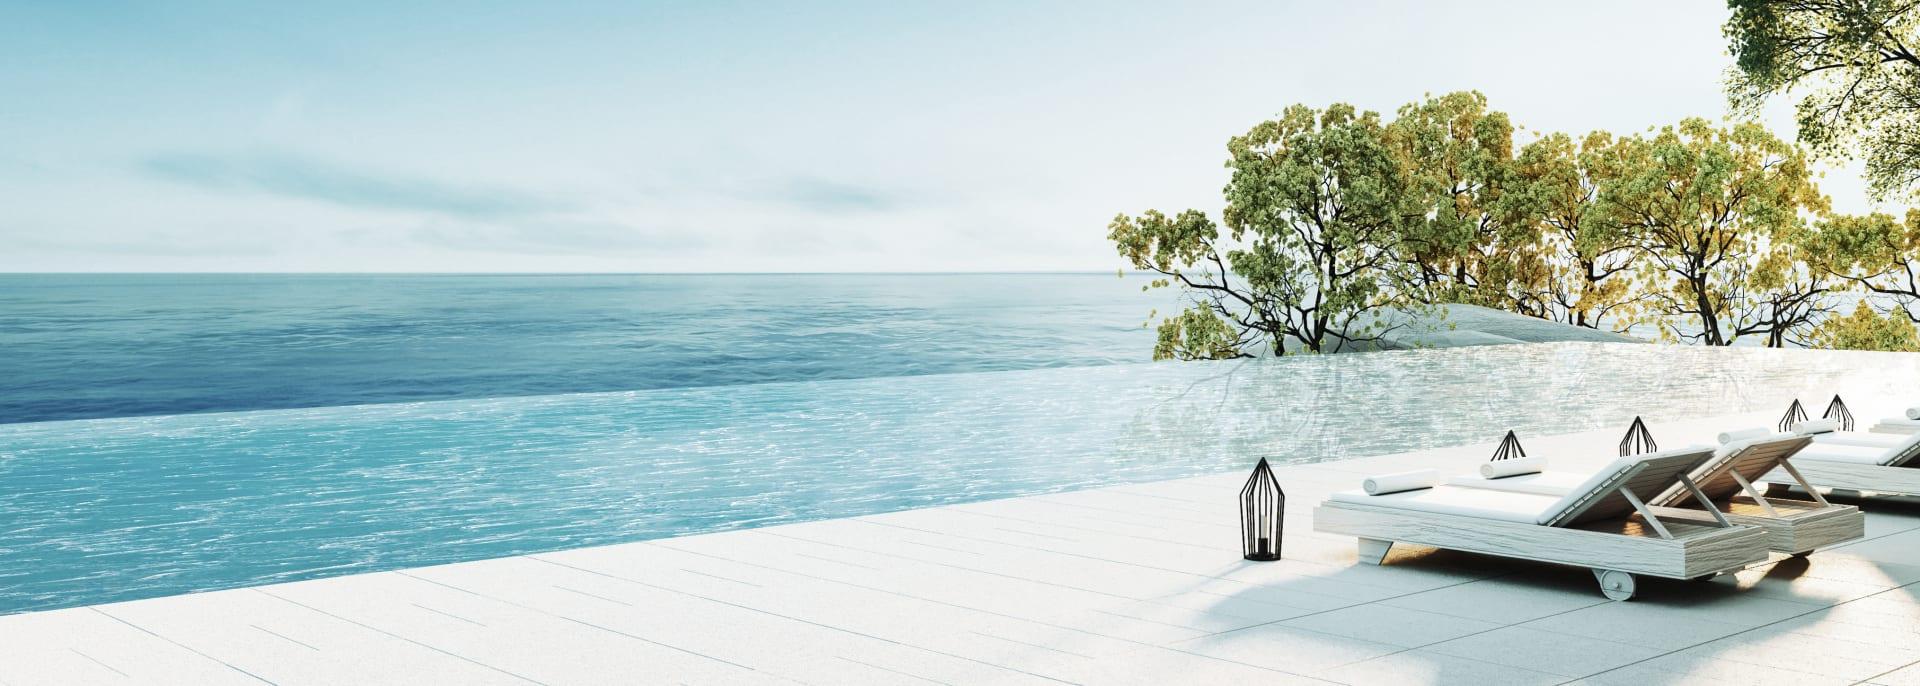 Pool_am_Strand